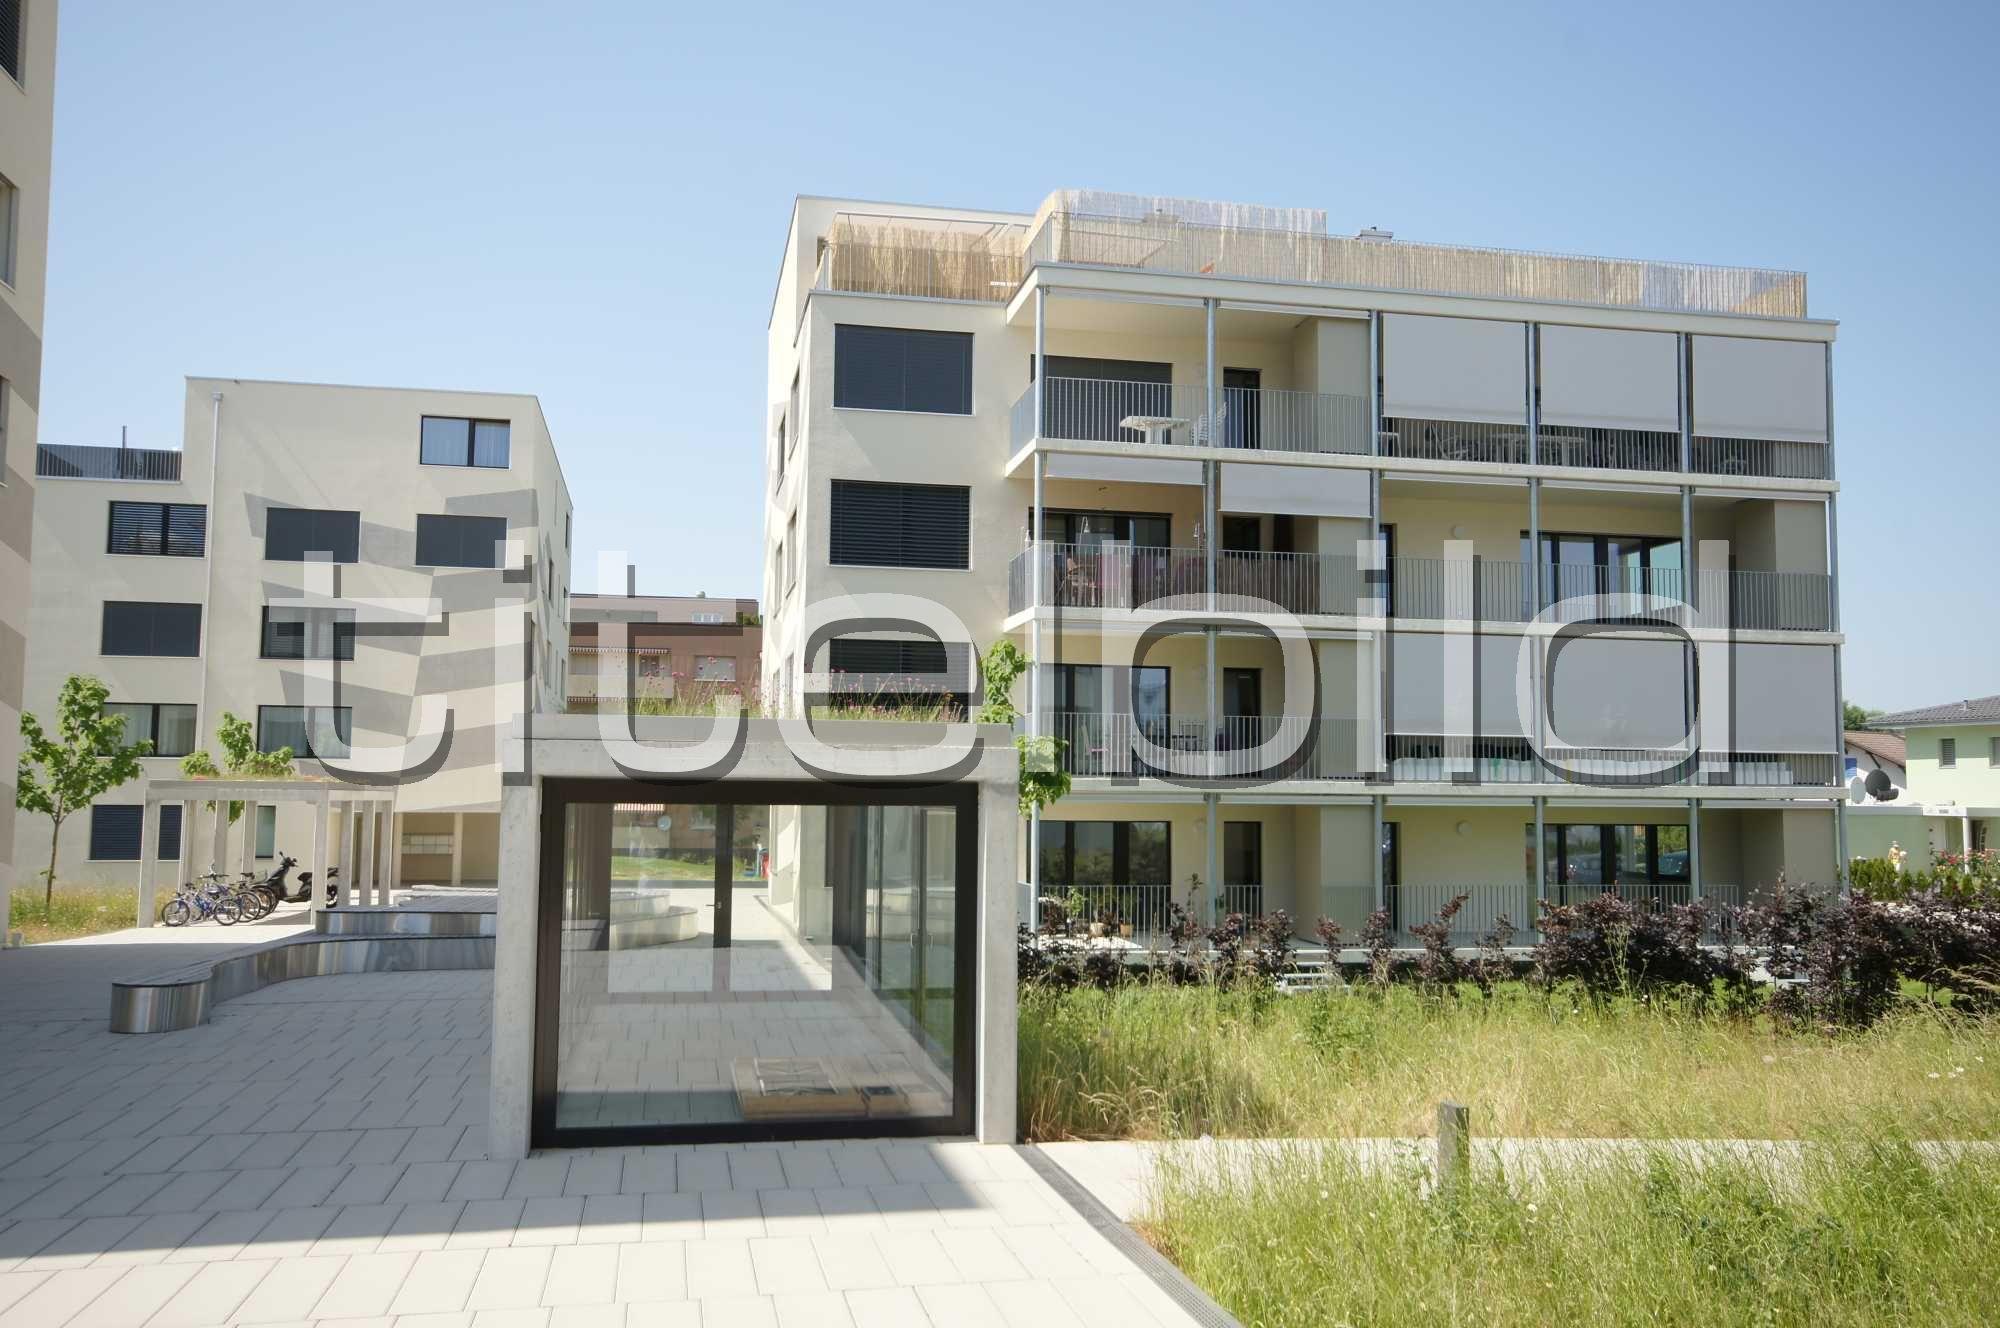 Projektbild-Nr. 2: Wohnüberbauung Dockland